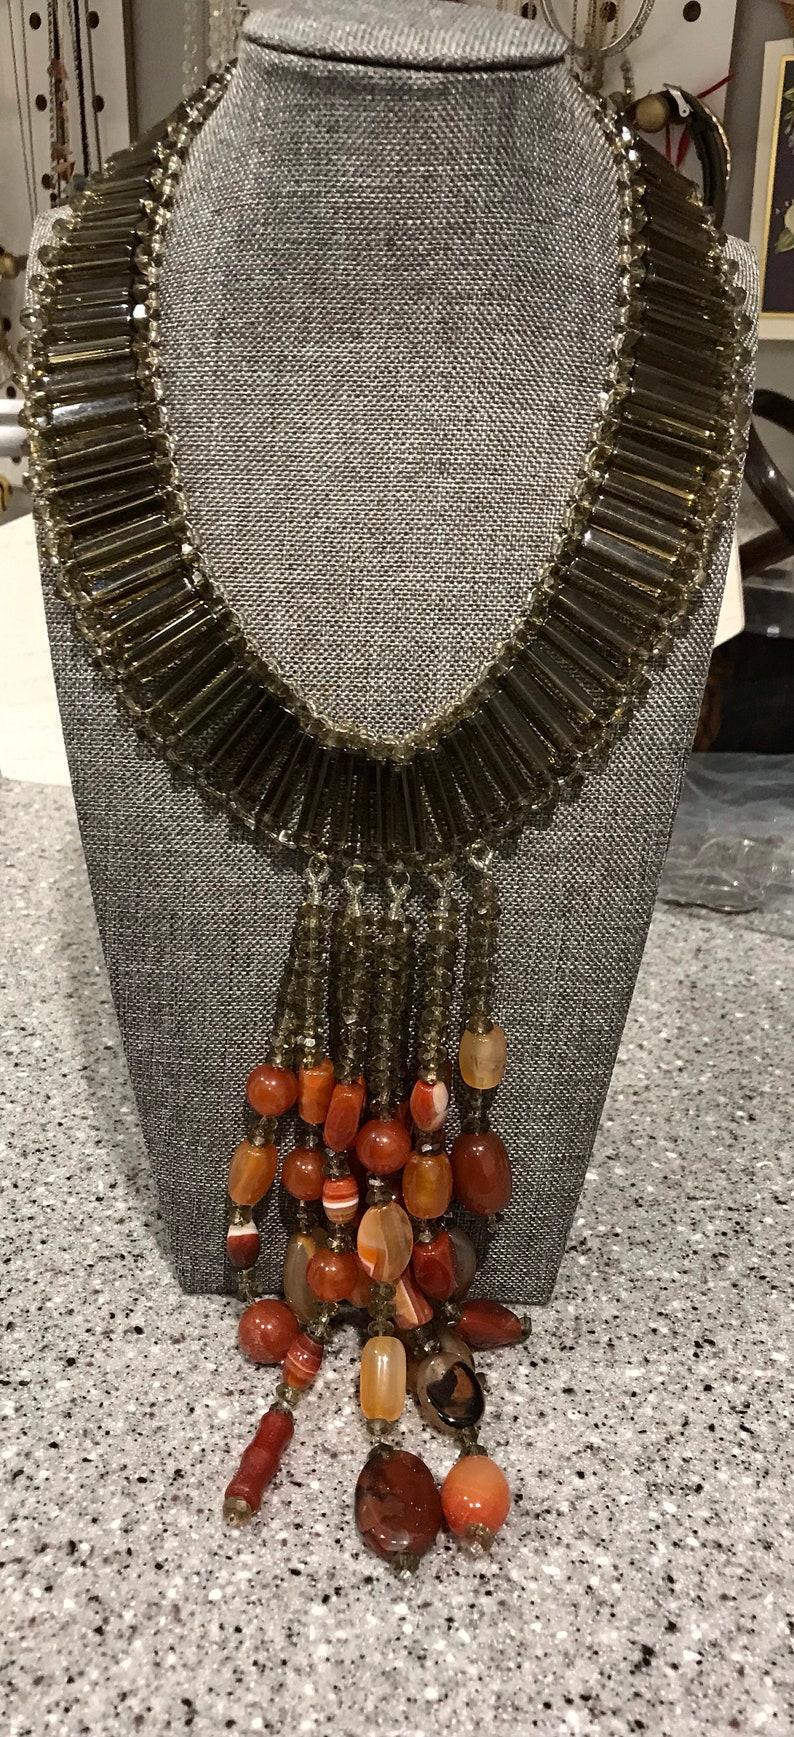 KeenlyDesigned carnelian and Czech smoky glass rod statement necklace